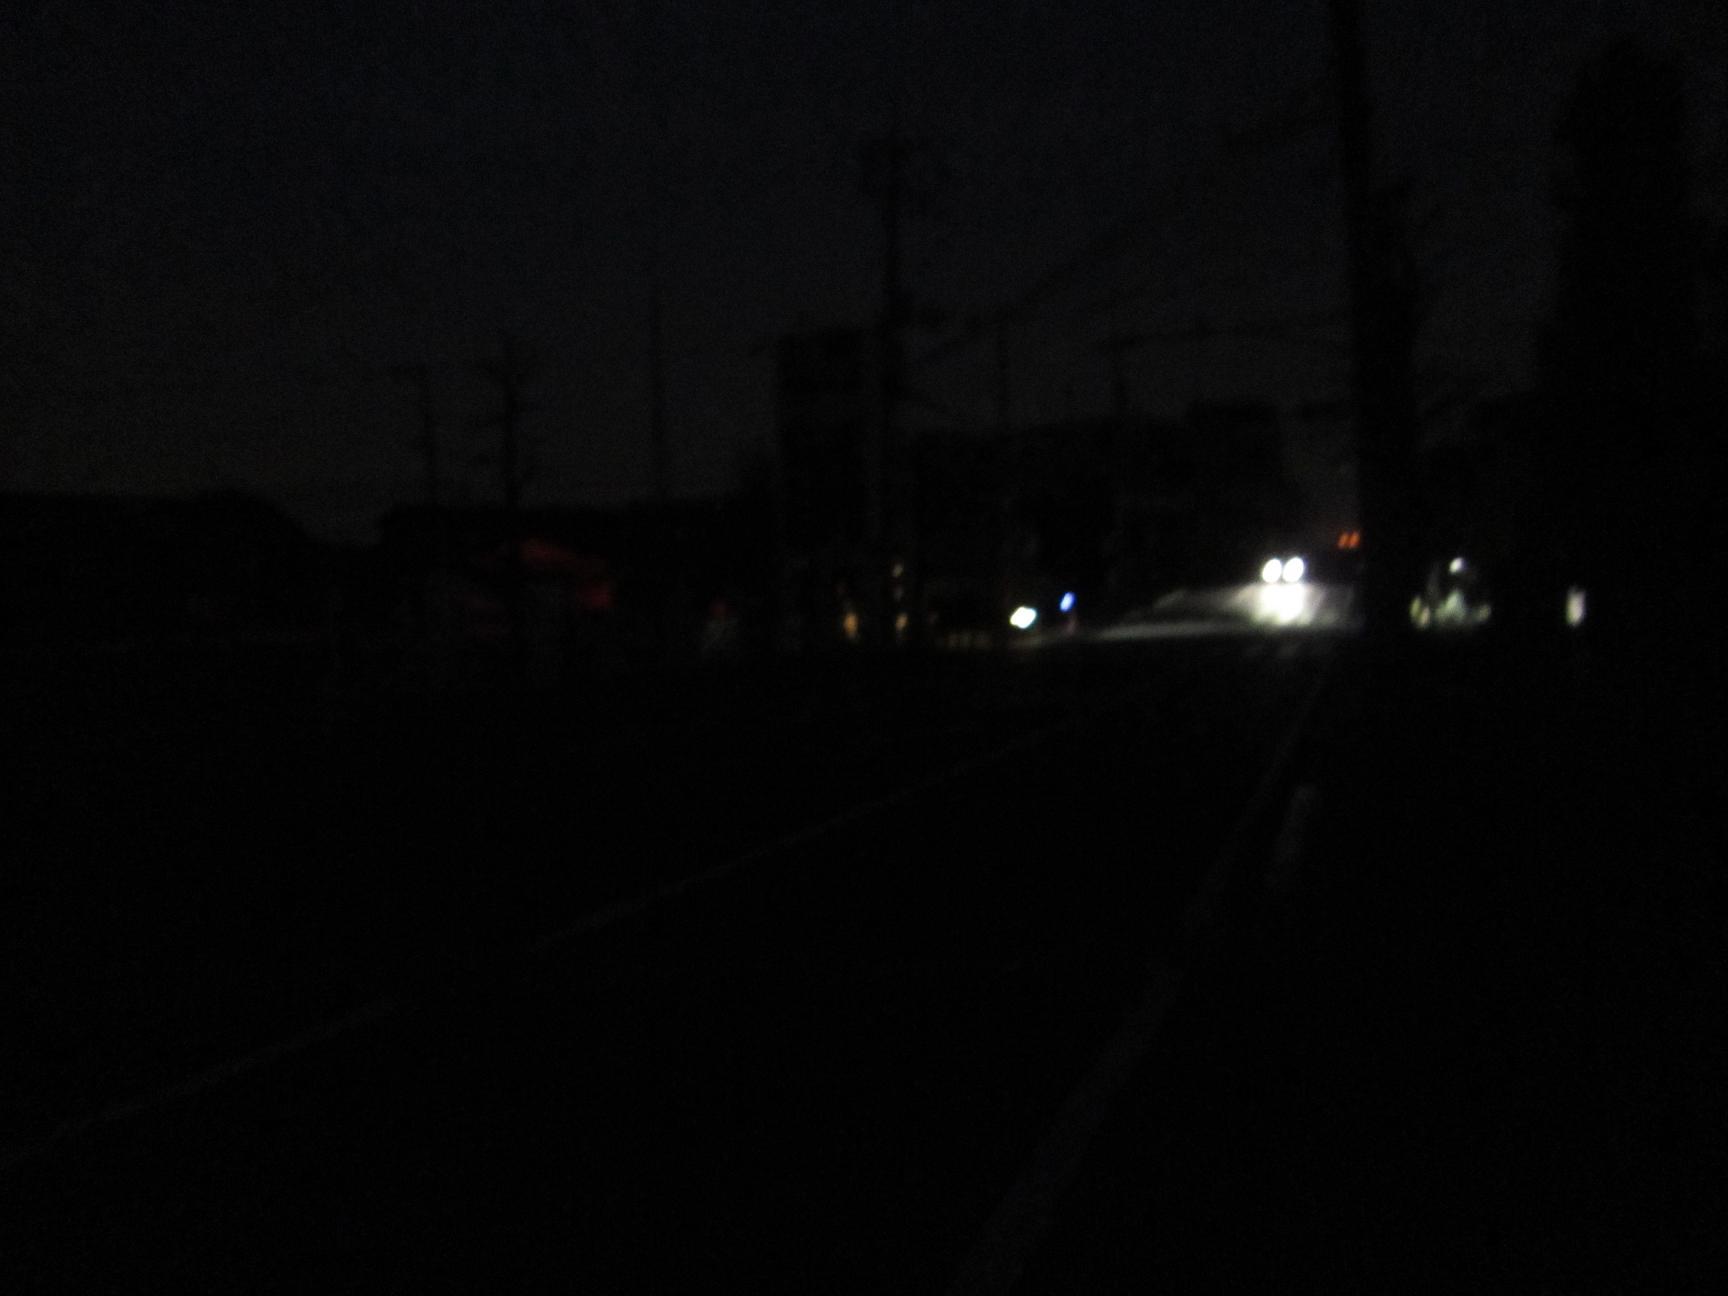 計画停電初日 バゥ_d0084229_2322427.jpg